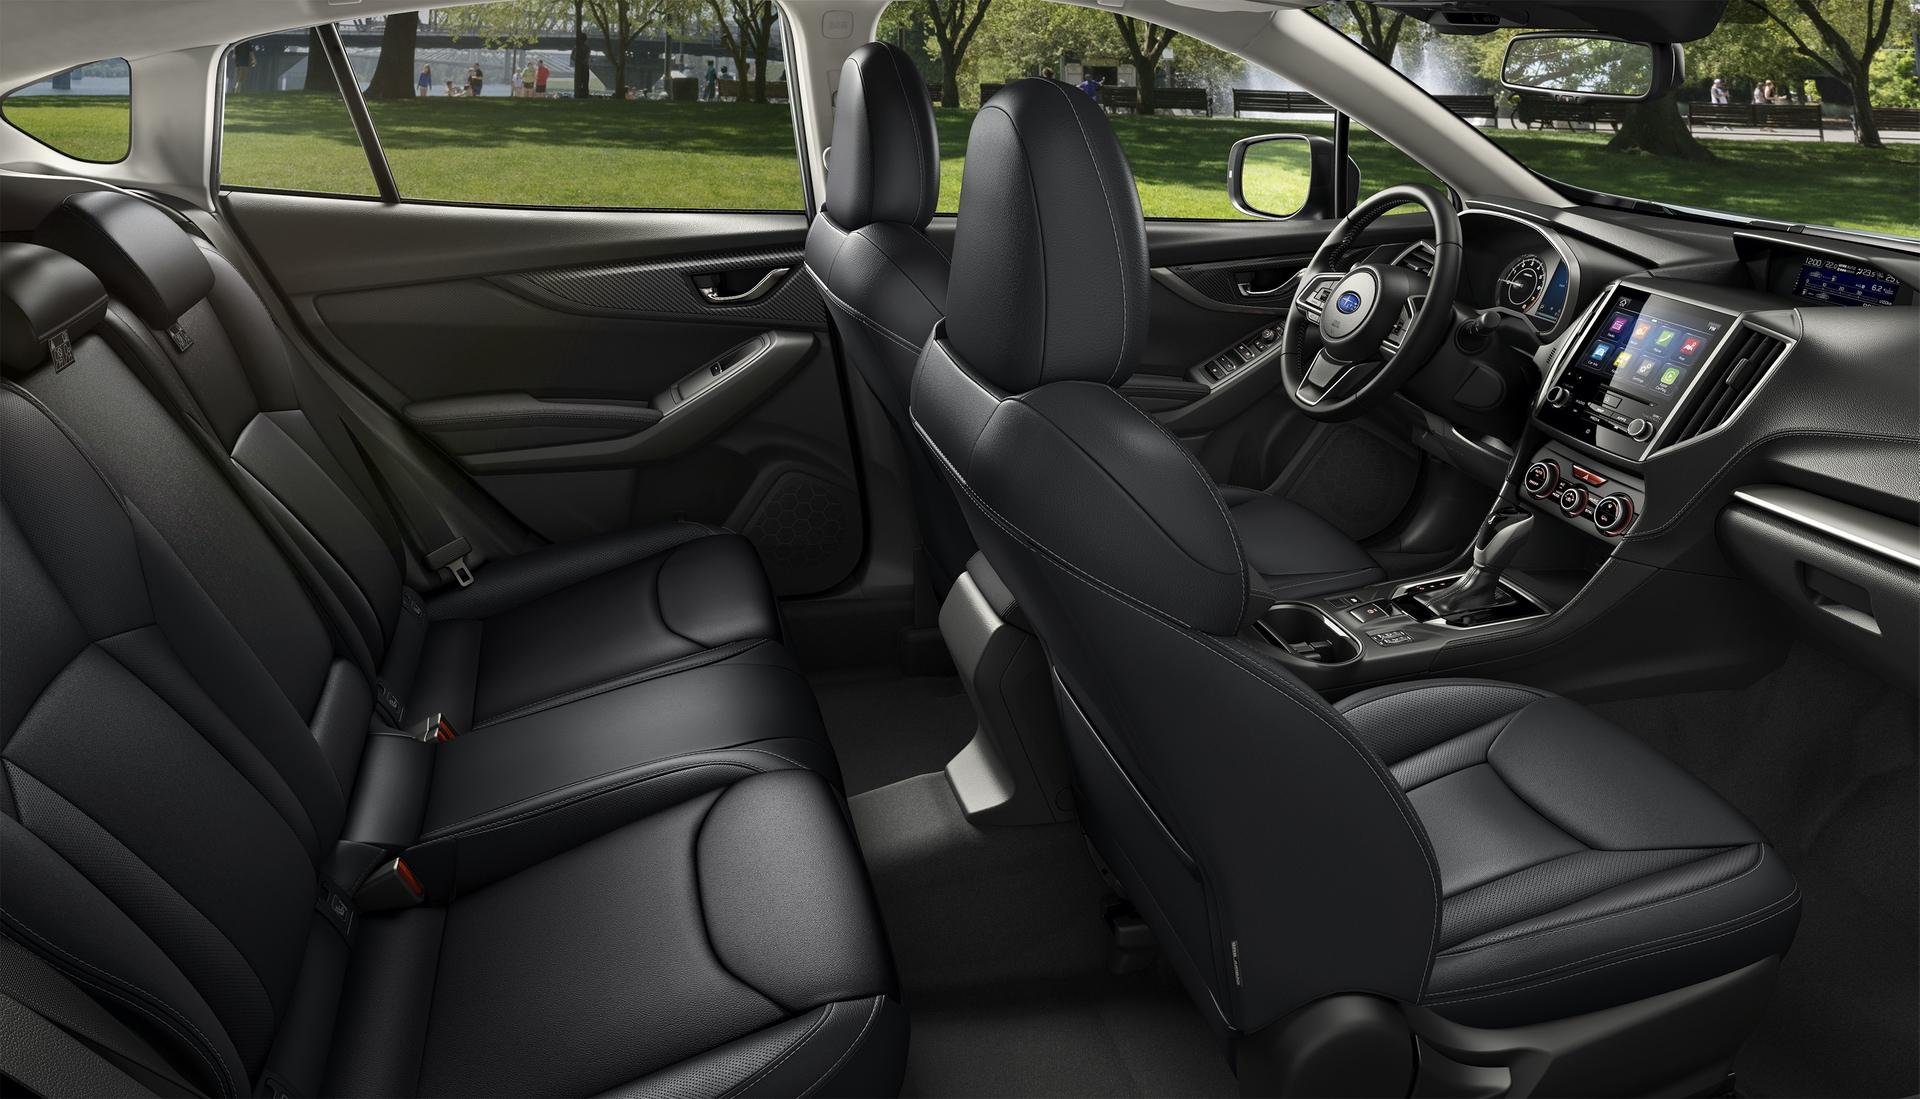 First_Drive_Subaru_Impreza_0004